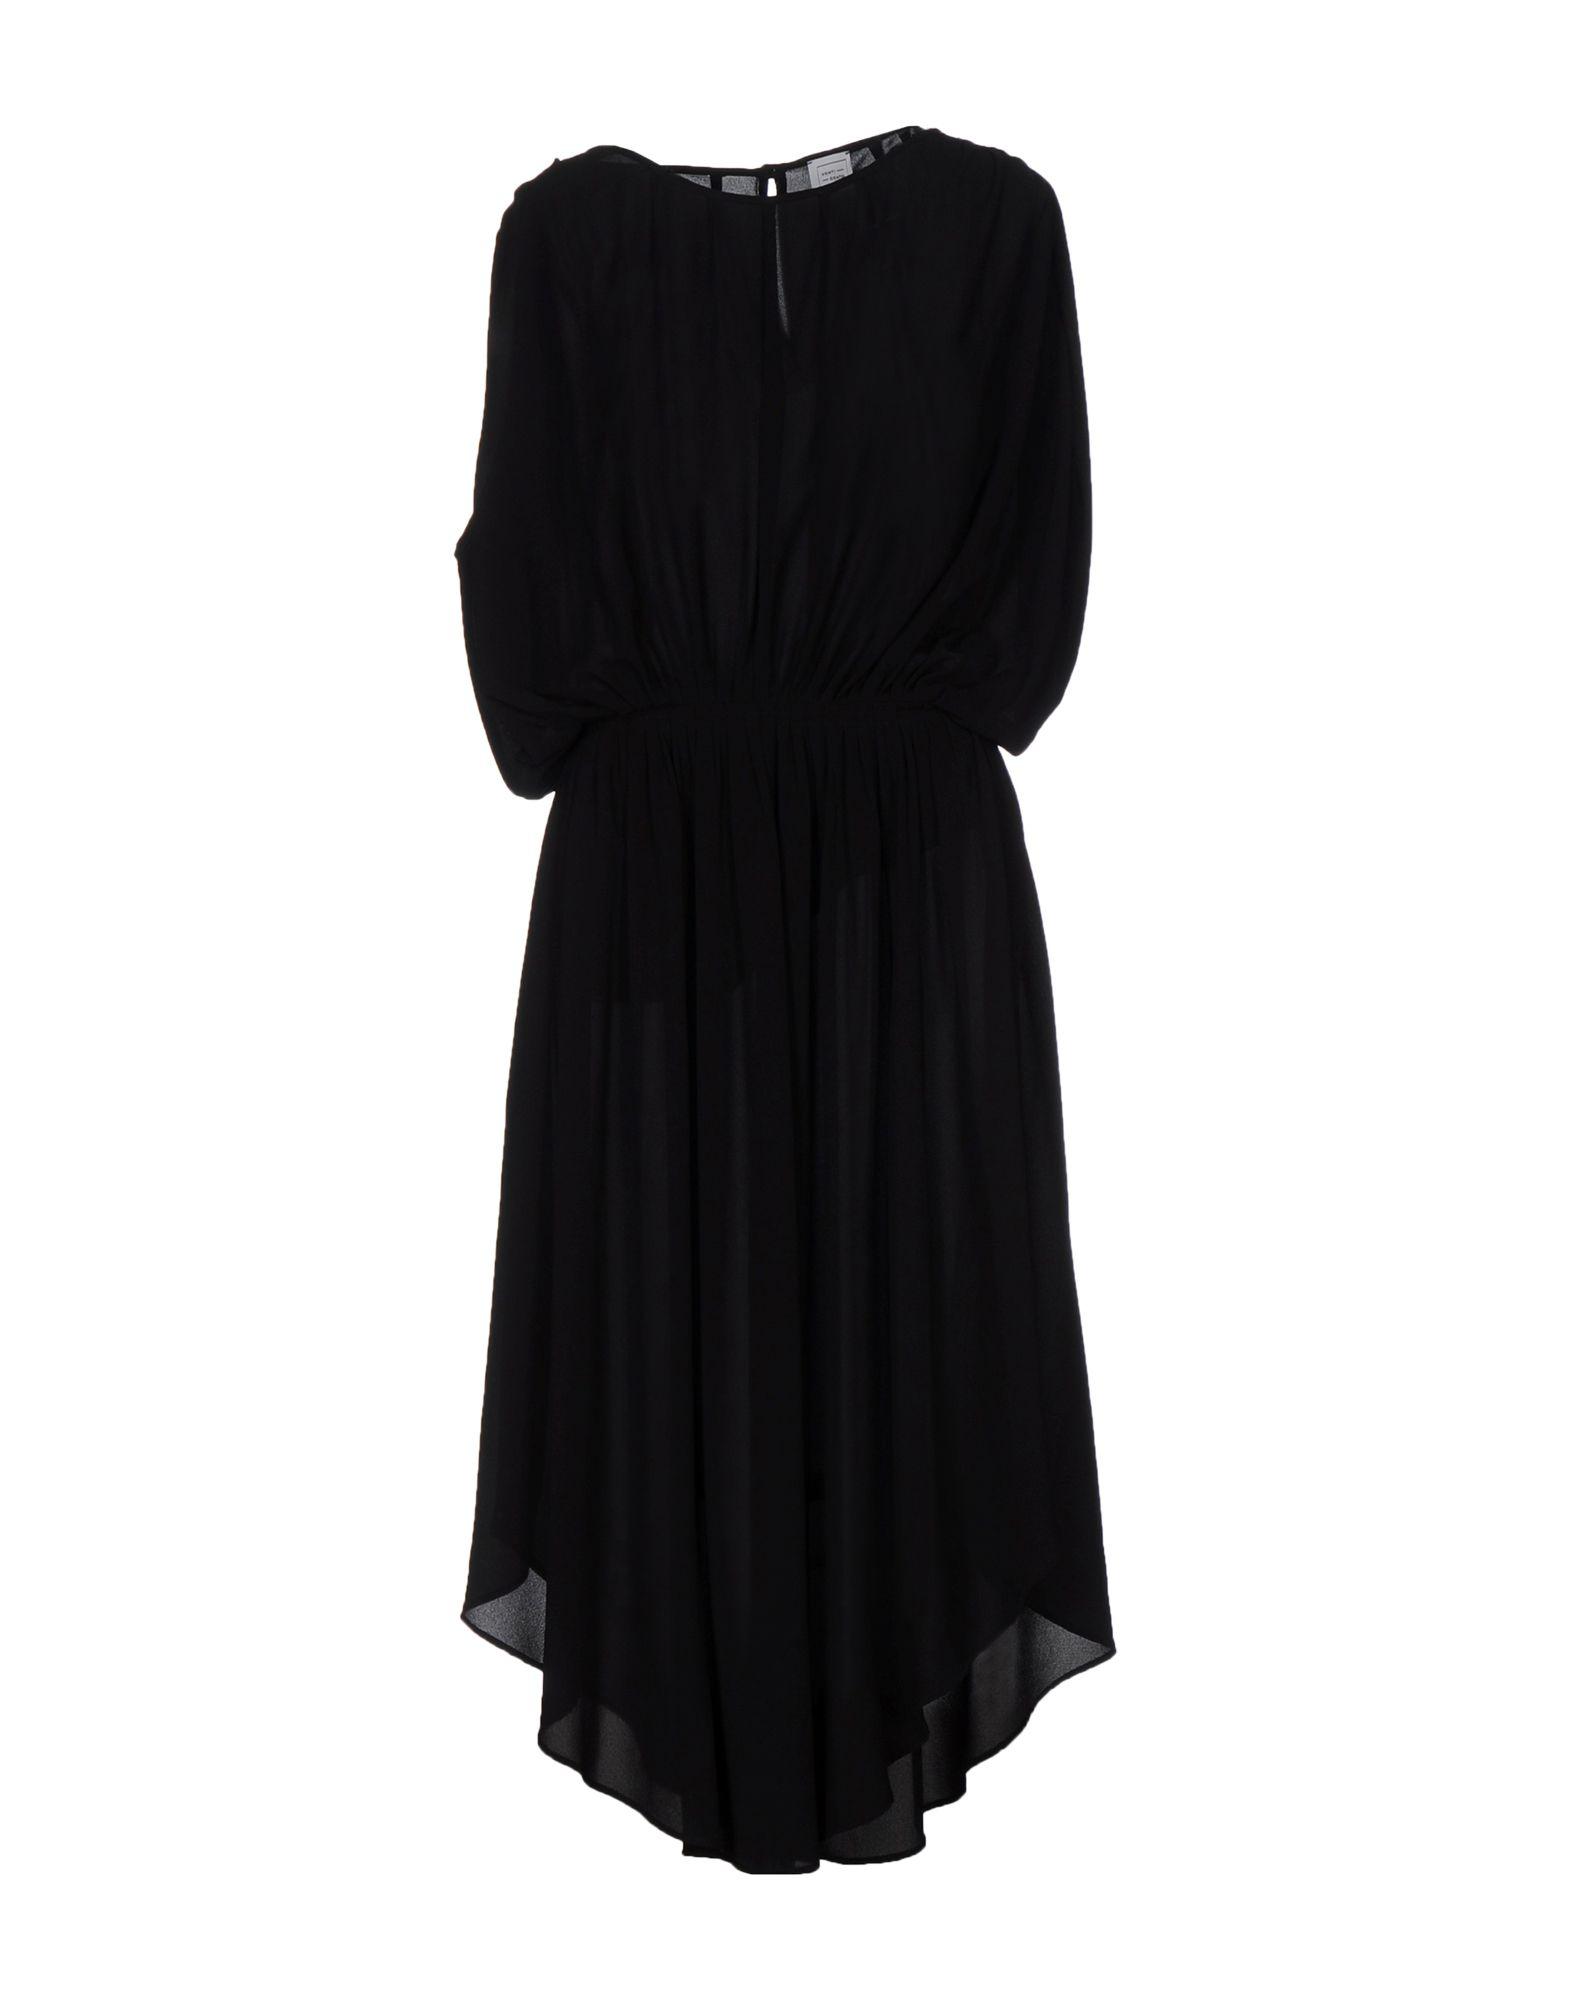 VENTI CENTO VENTUNO Платье до колена